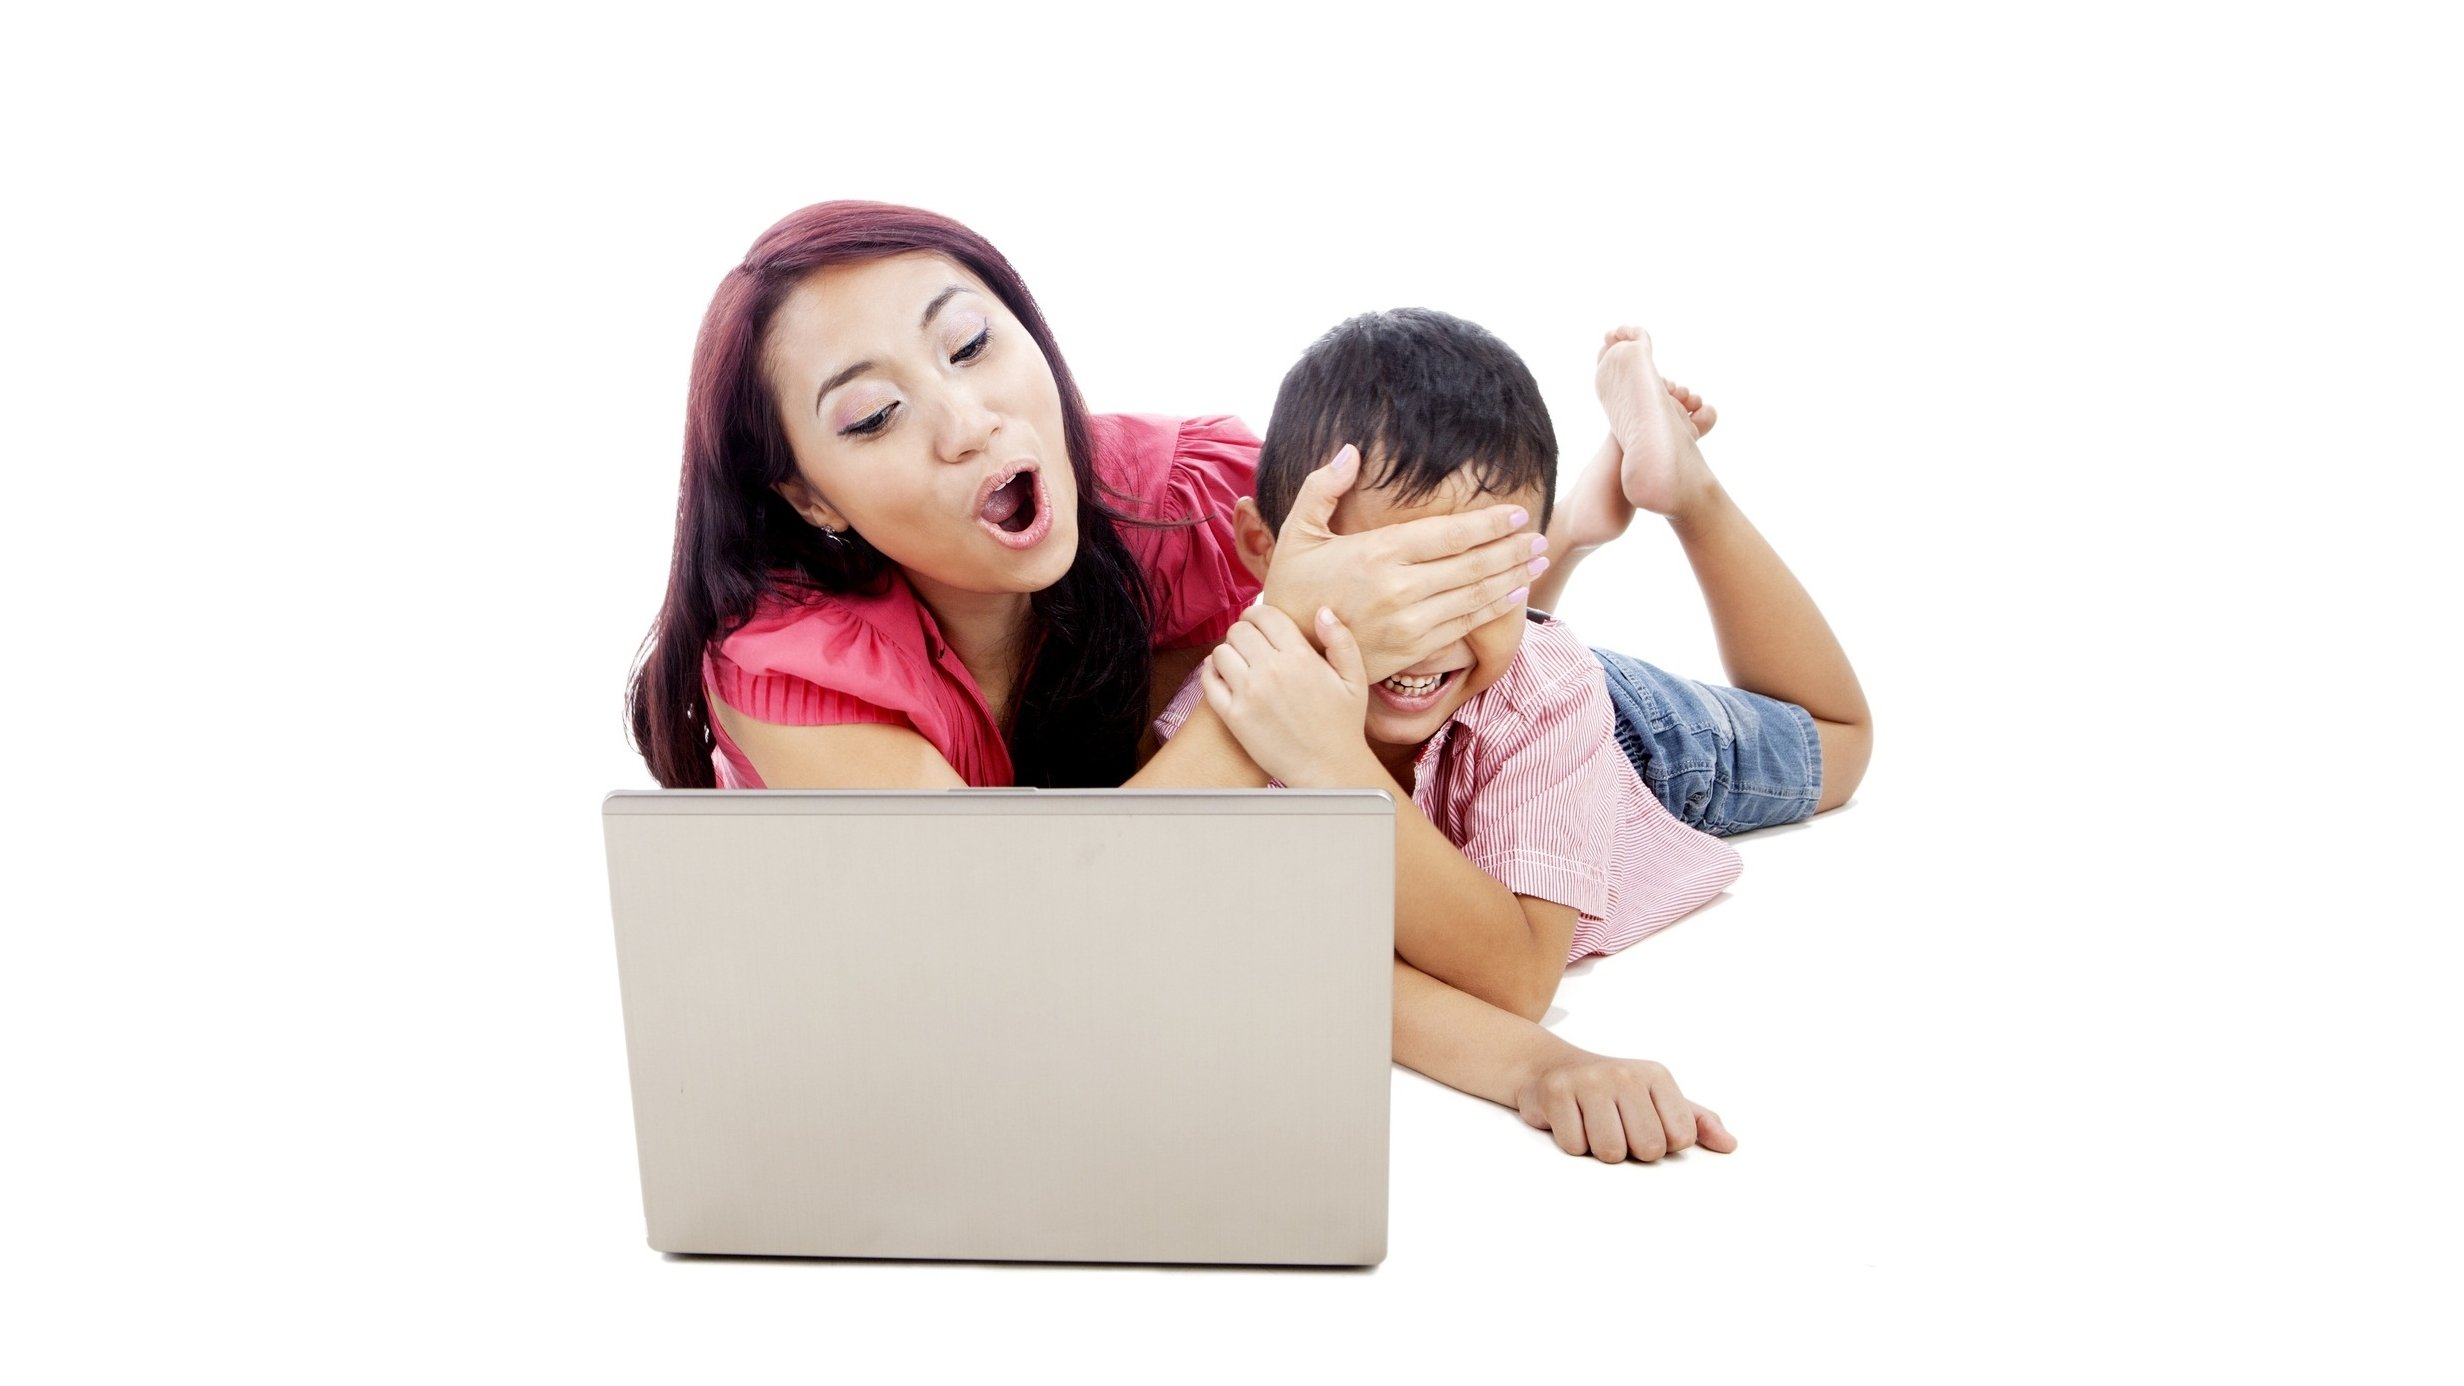 Parental Controls on the Internet